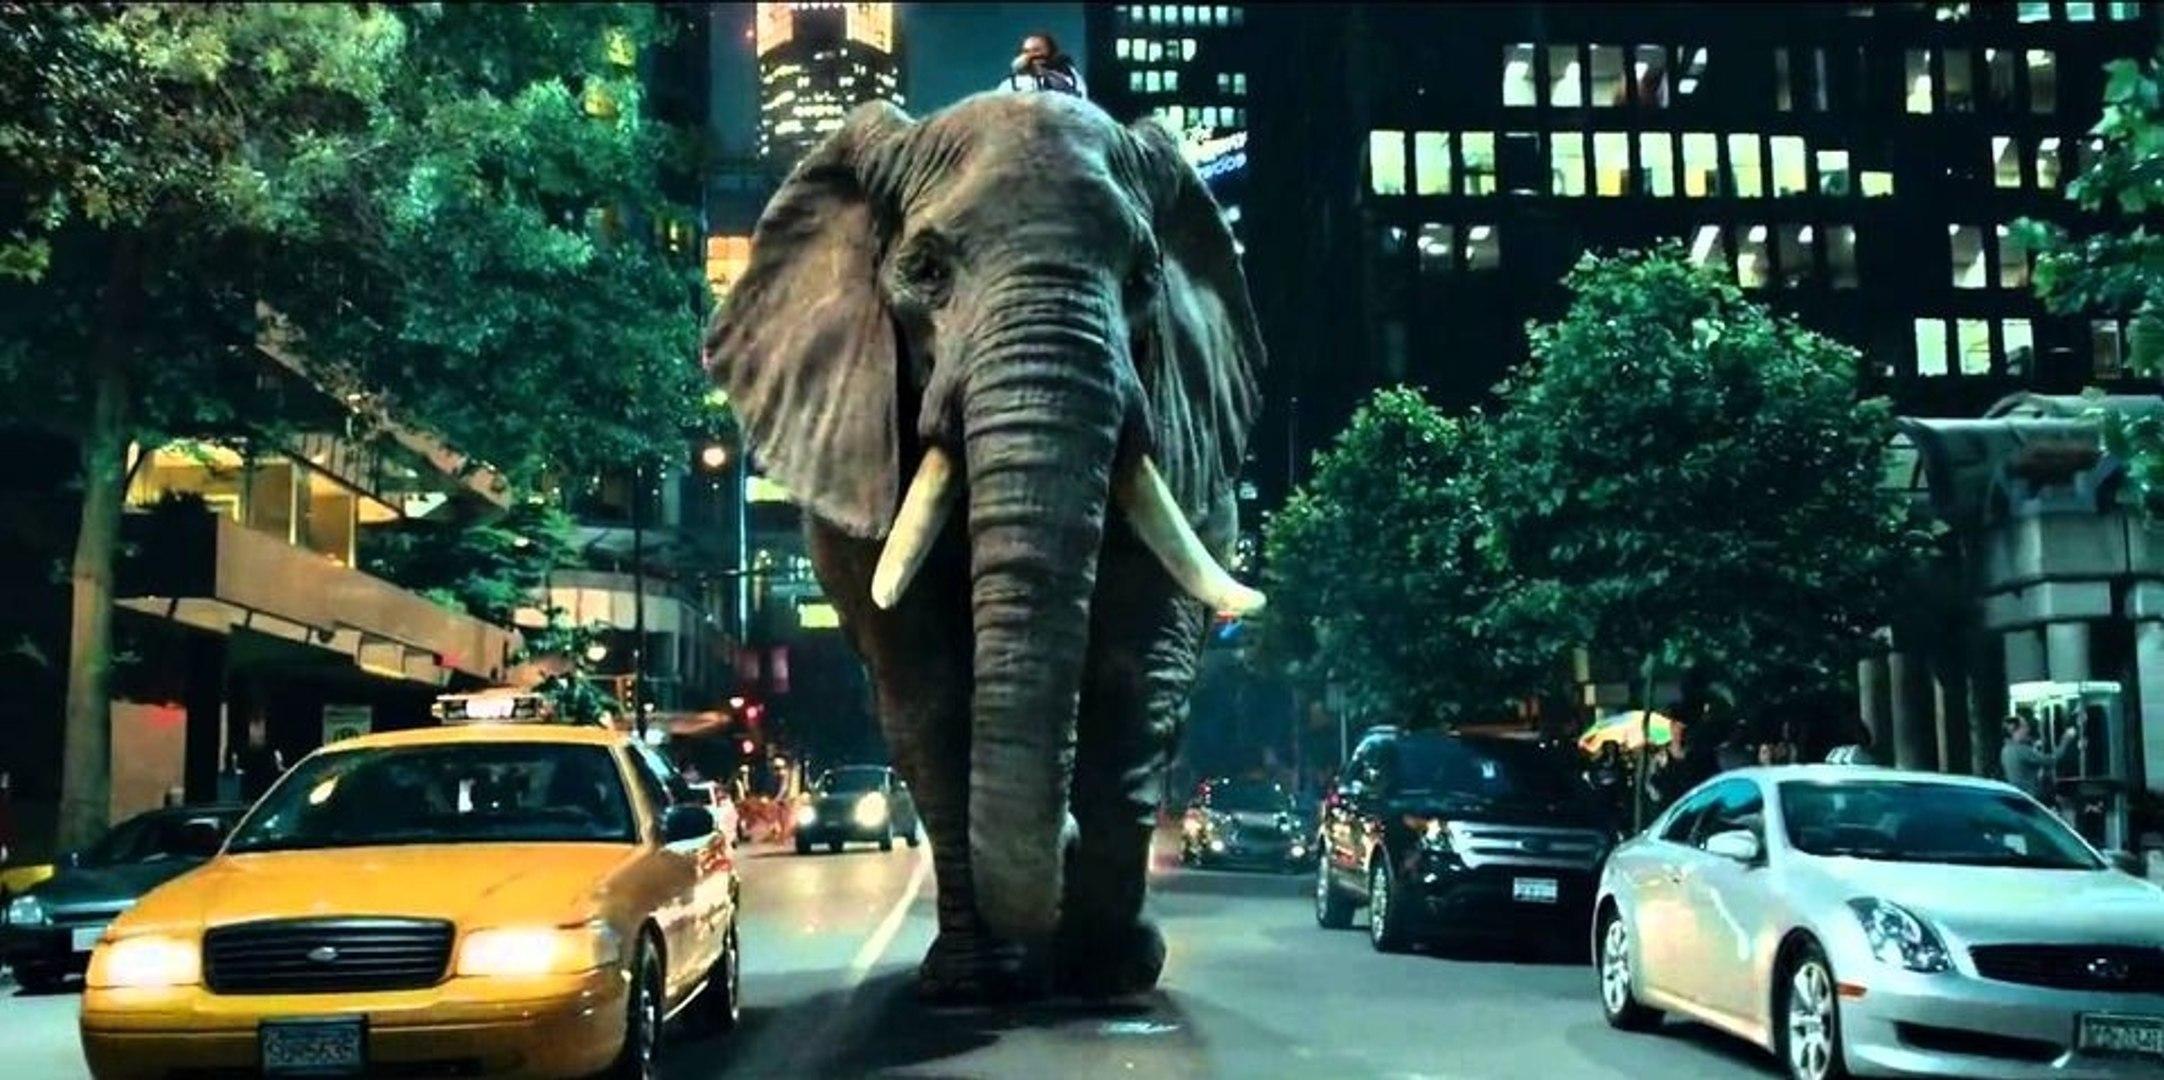 Epic Elephunk – Money Super Market's TV Advertisement